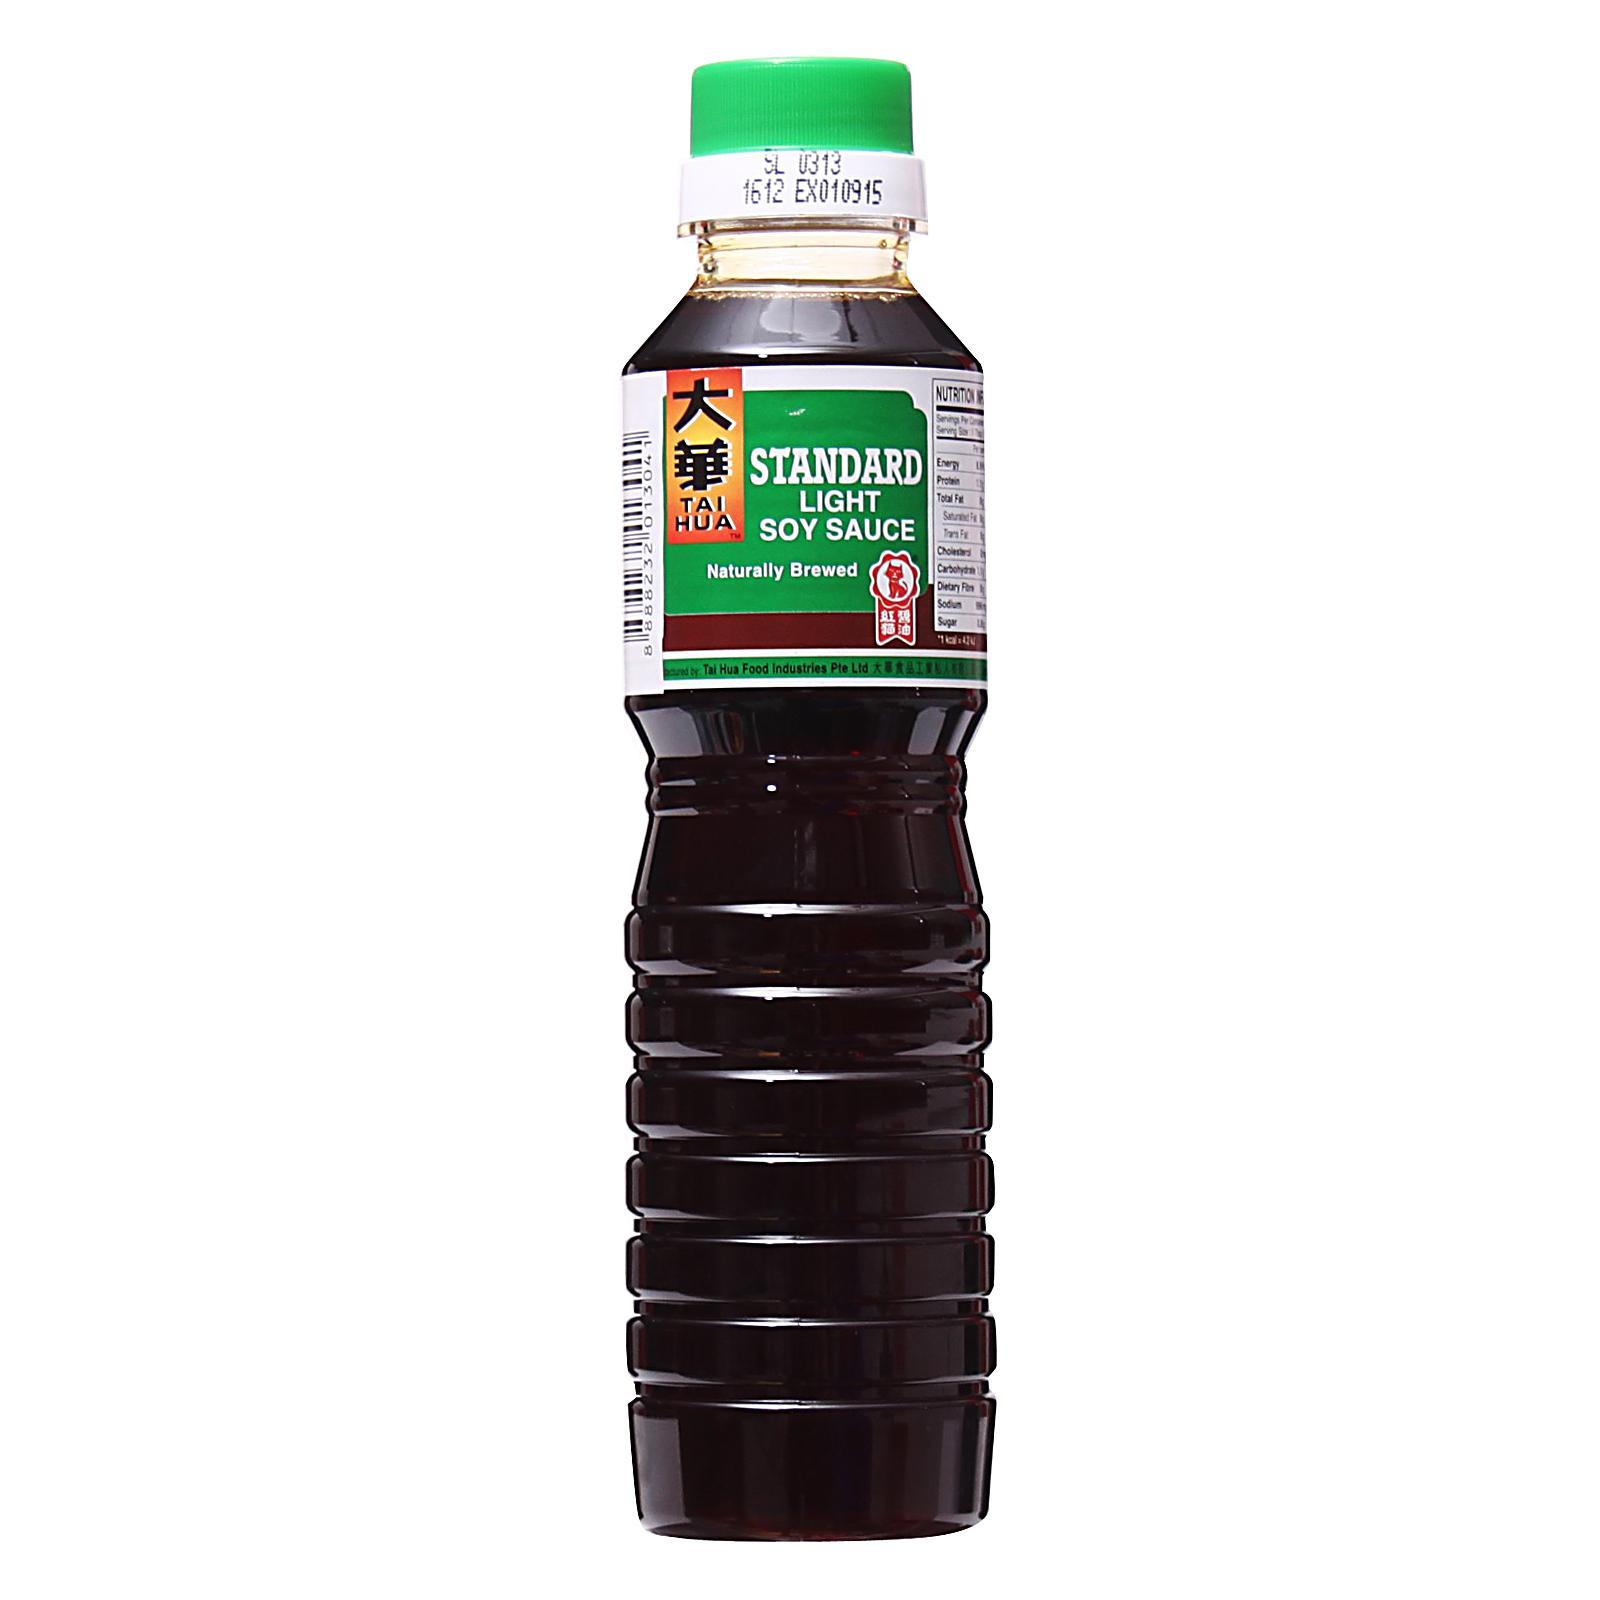 TAI HUA Standard Light Soy Sauce 320ml